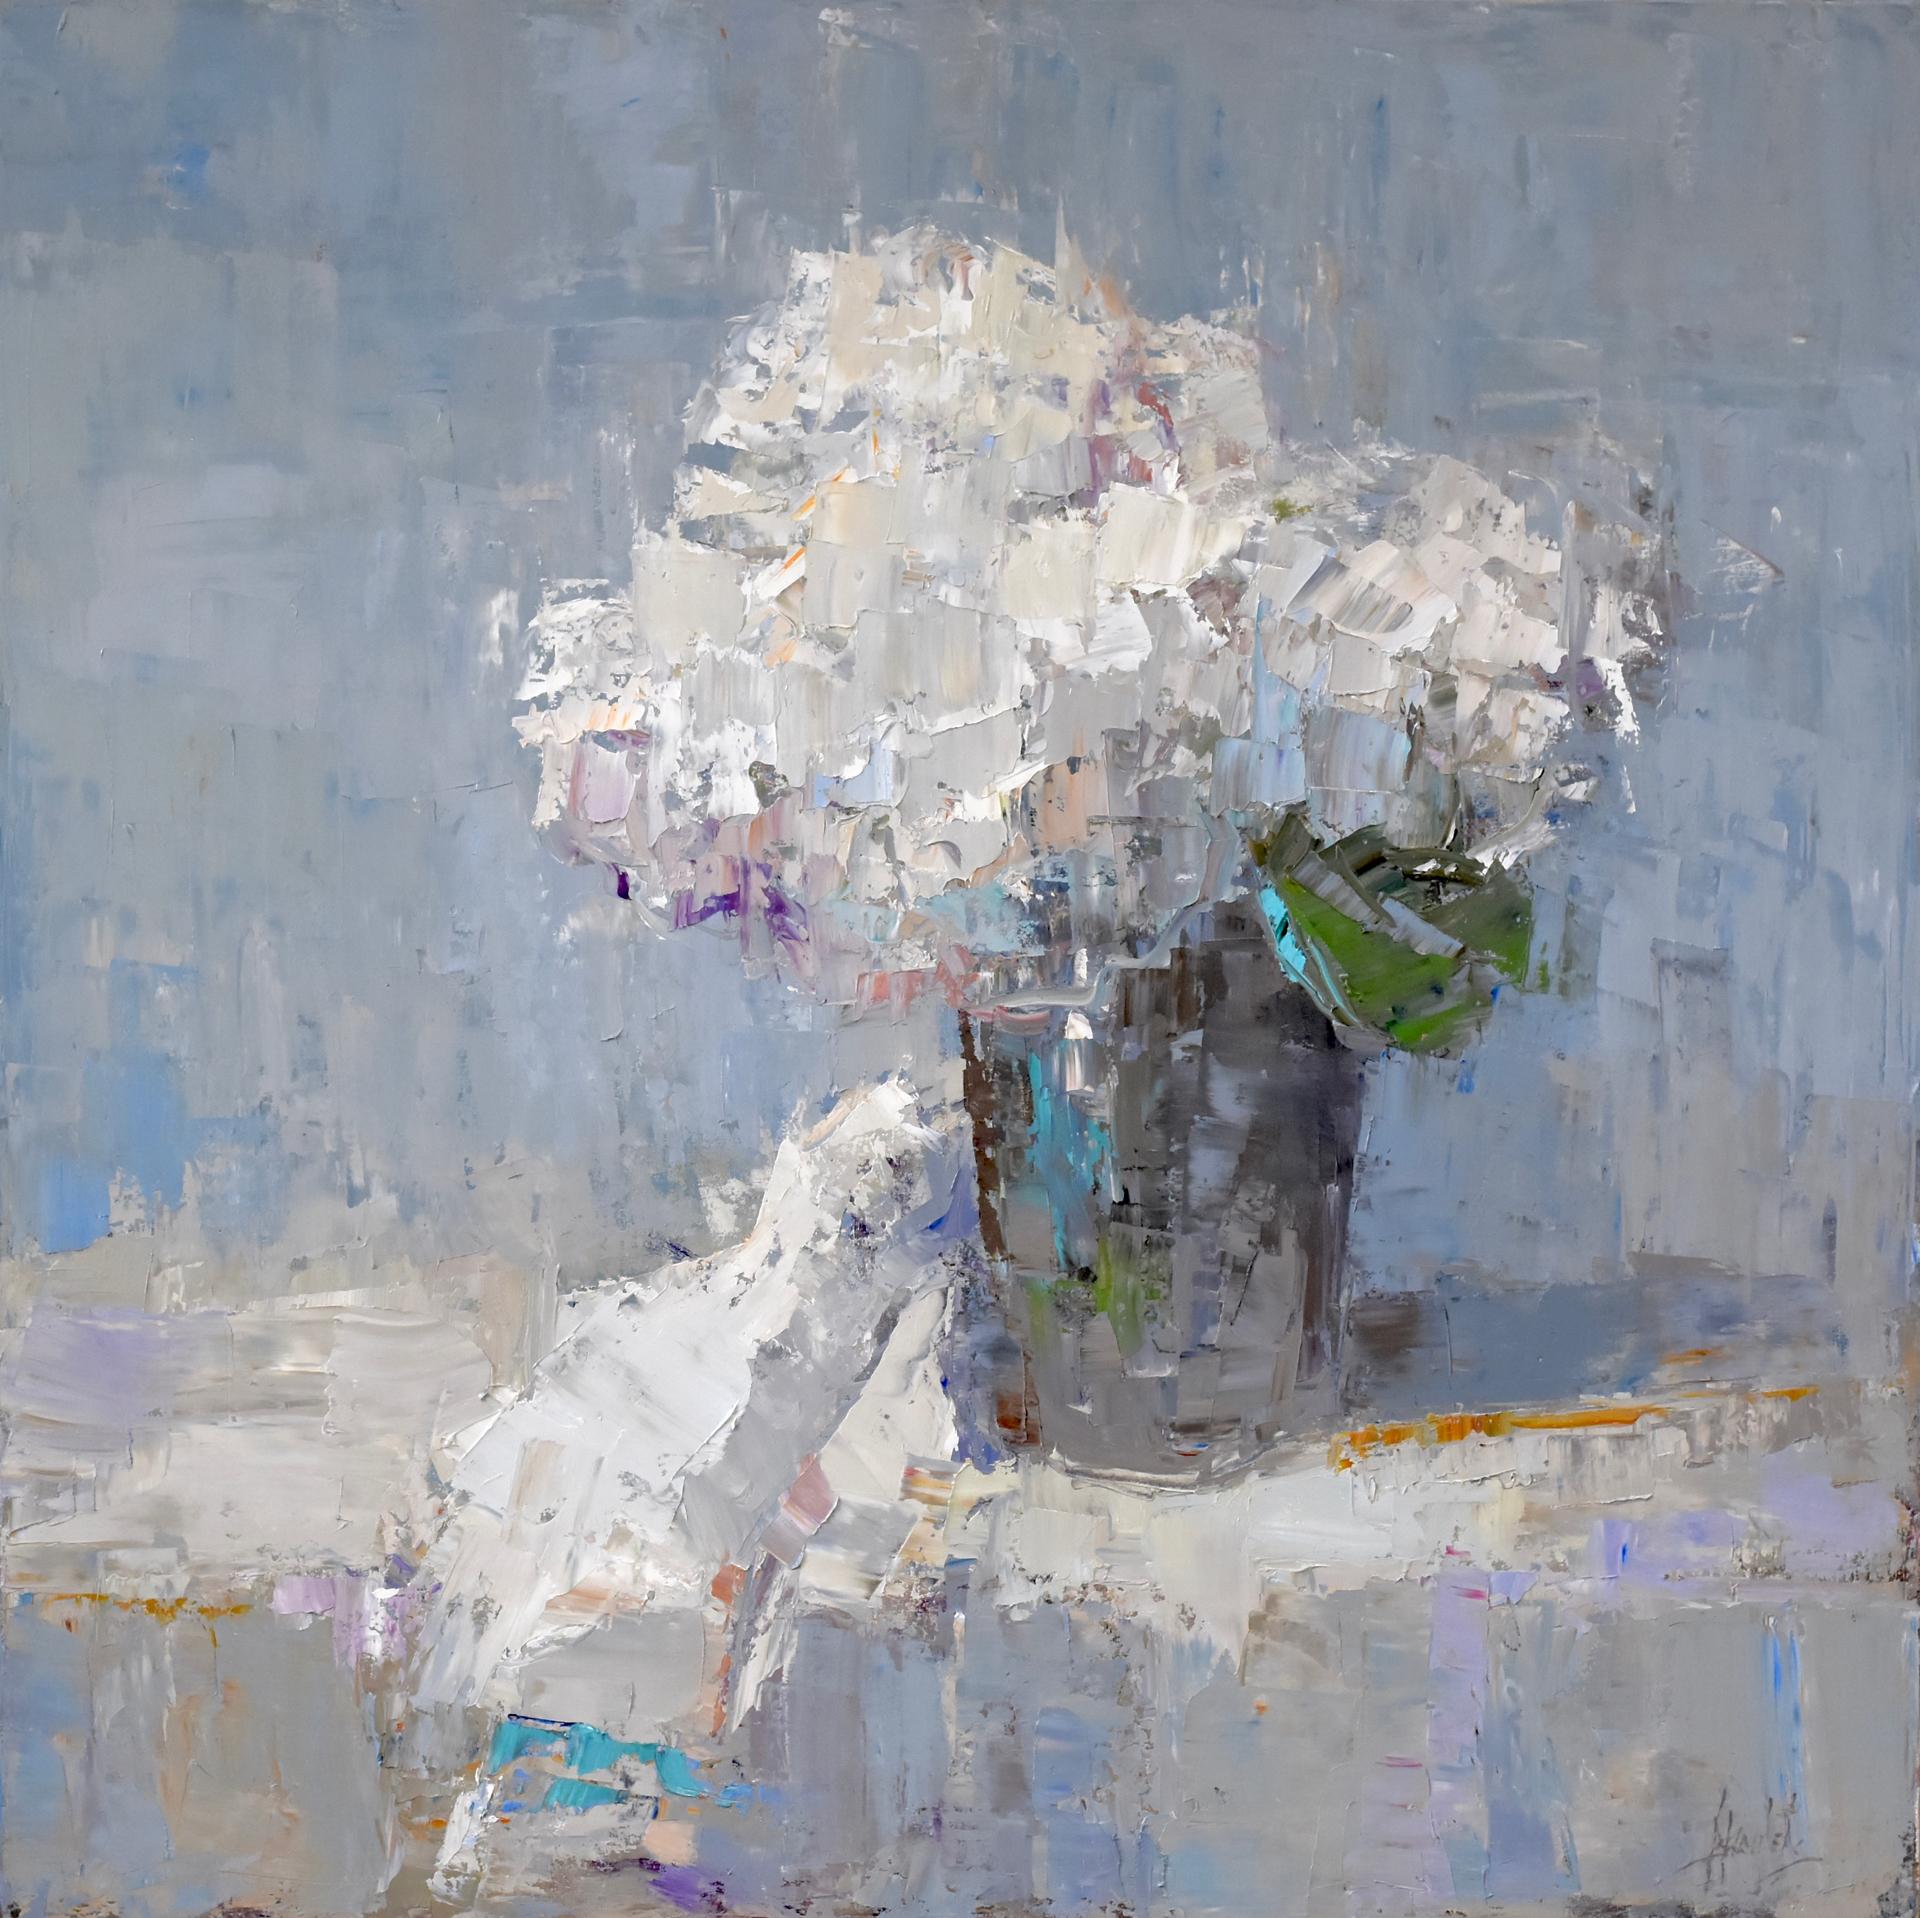 Hydrangeas on Table by Barbara Flowers